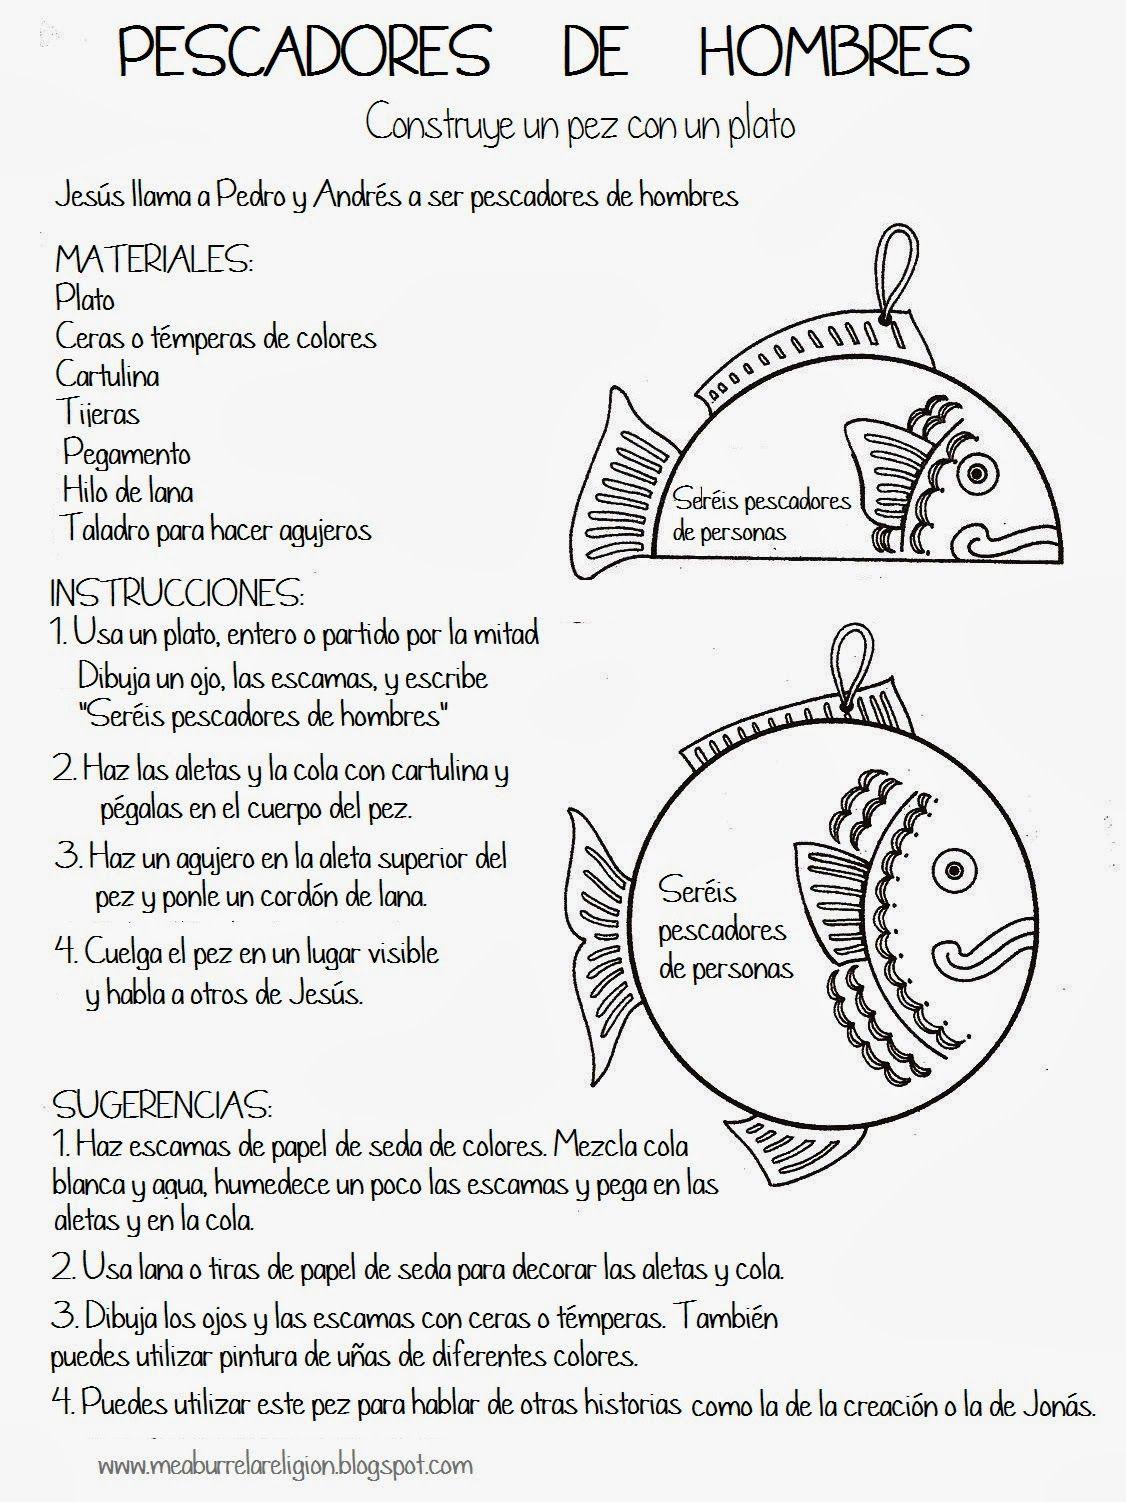 Manualidad pez. La pesca milagrosa | igle | Pinterest | La pesca ...